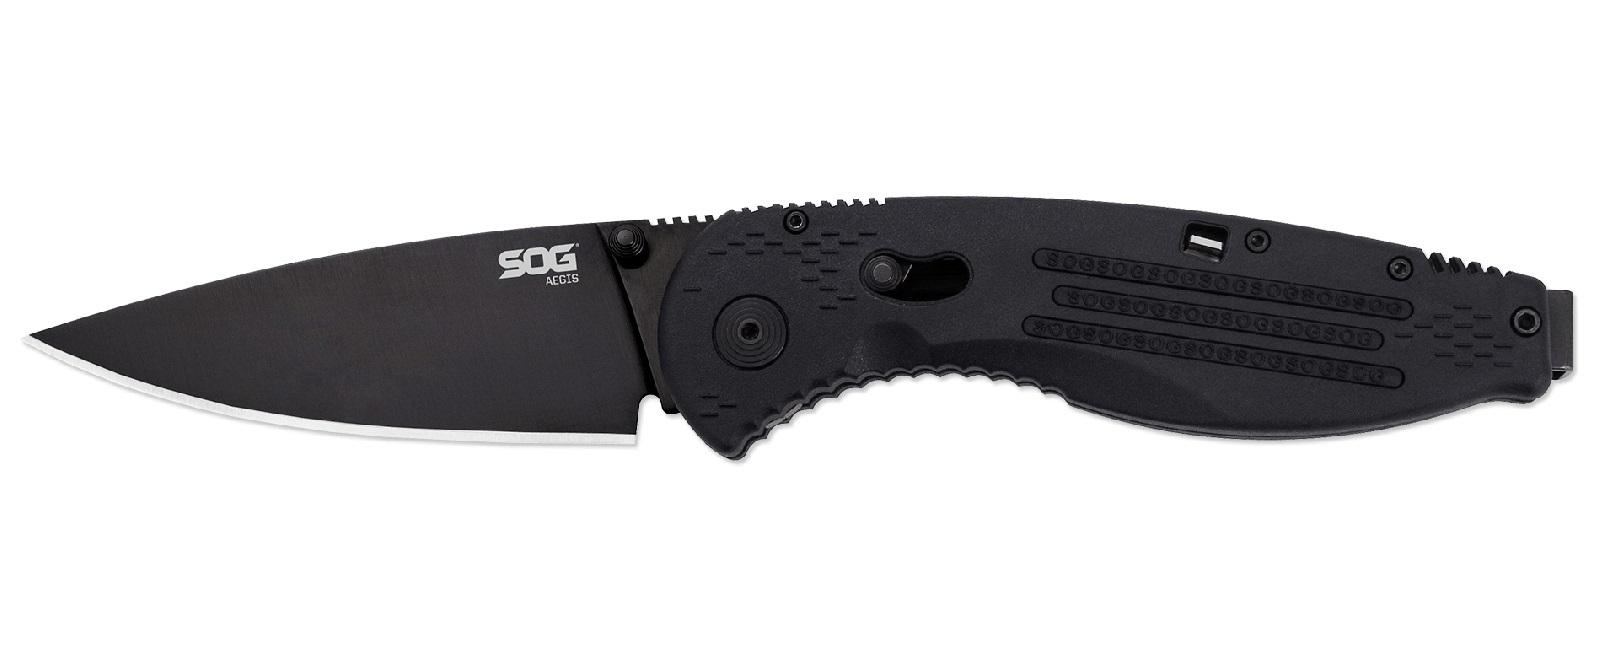 Фото 3 - Складной нож с фиксатором Aegis Black 8.9 см. - SOG AE02, сталь AUS-8, рукоять пластик GRN